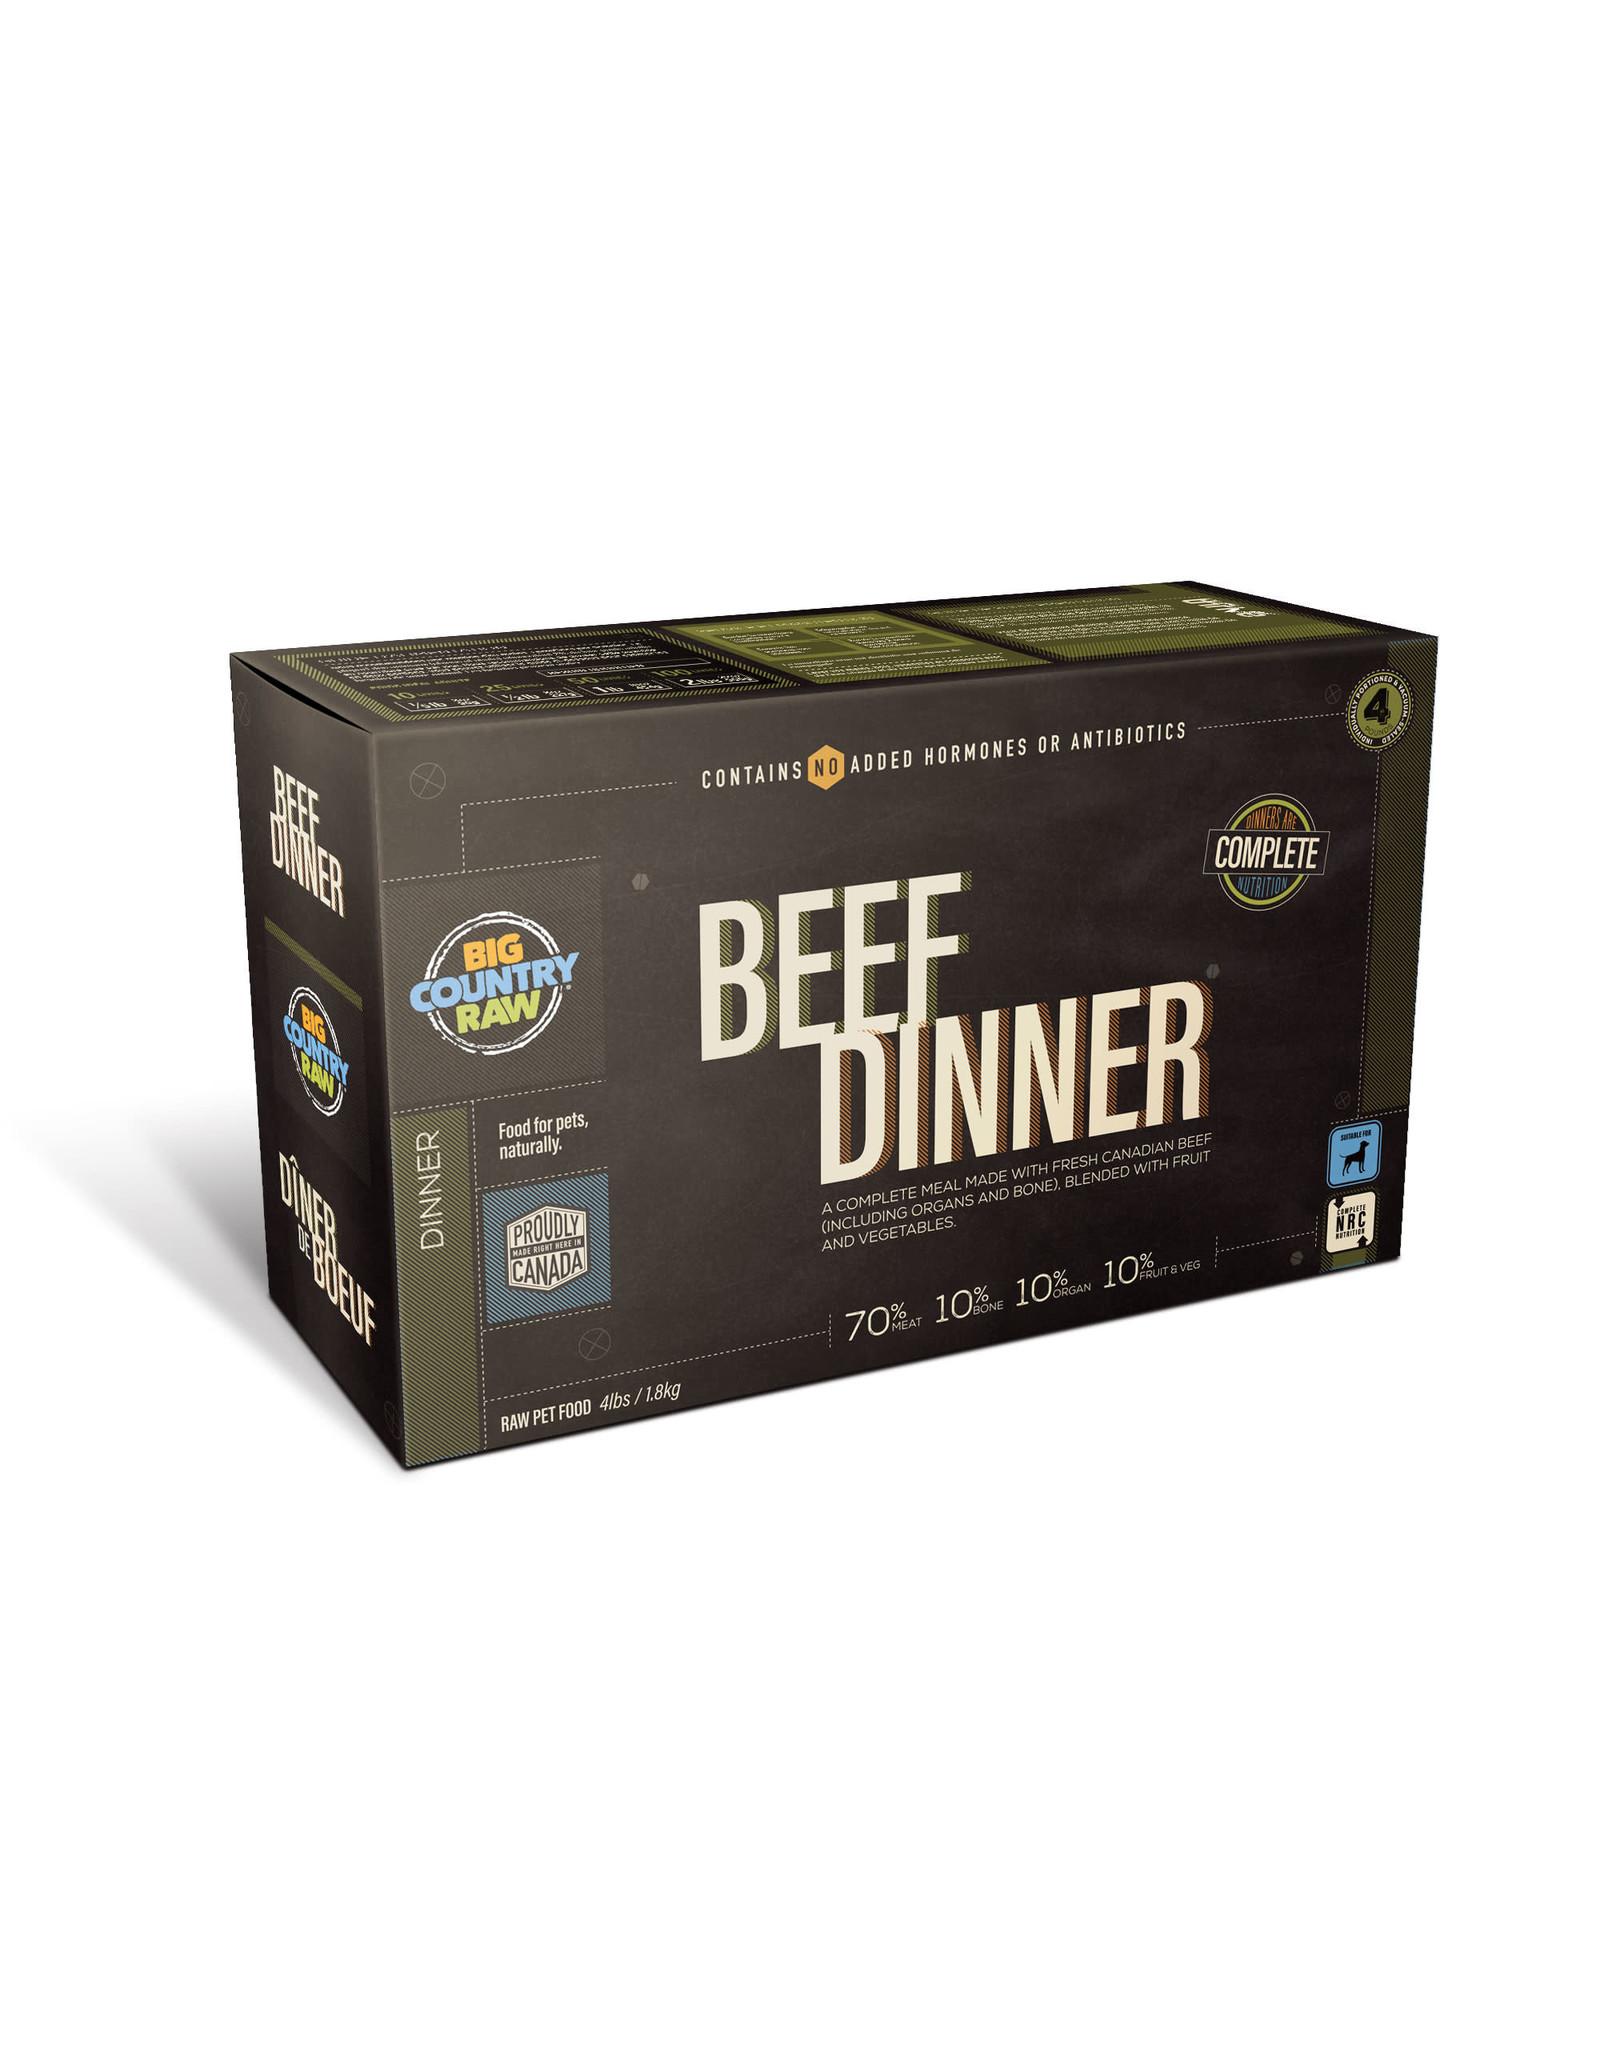 Big Country Raw BCR CARTON - 4x1lb - Beef Dinner